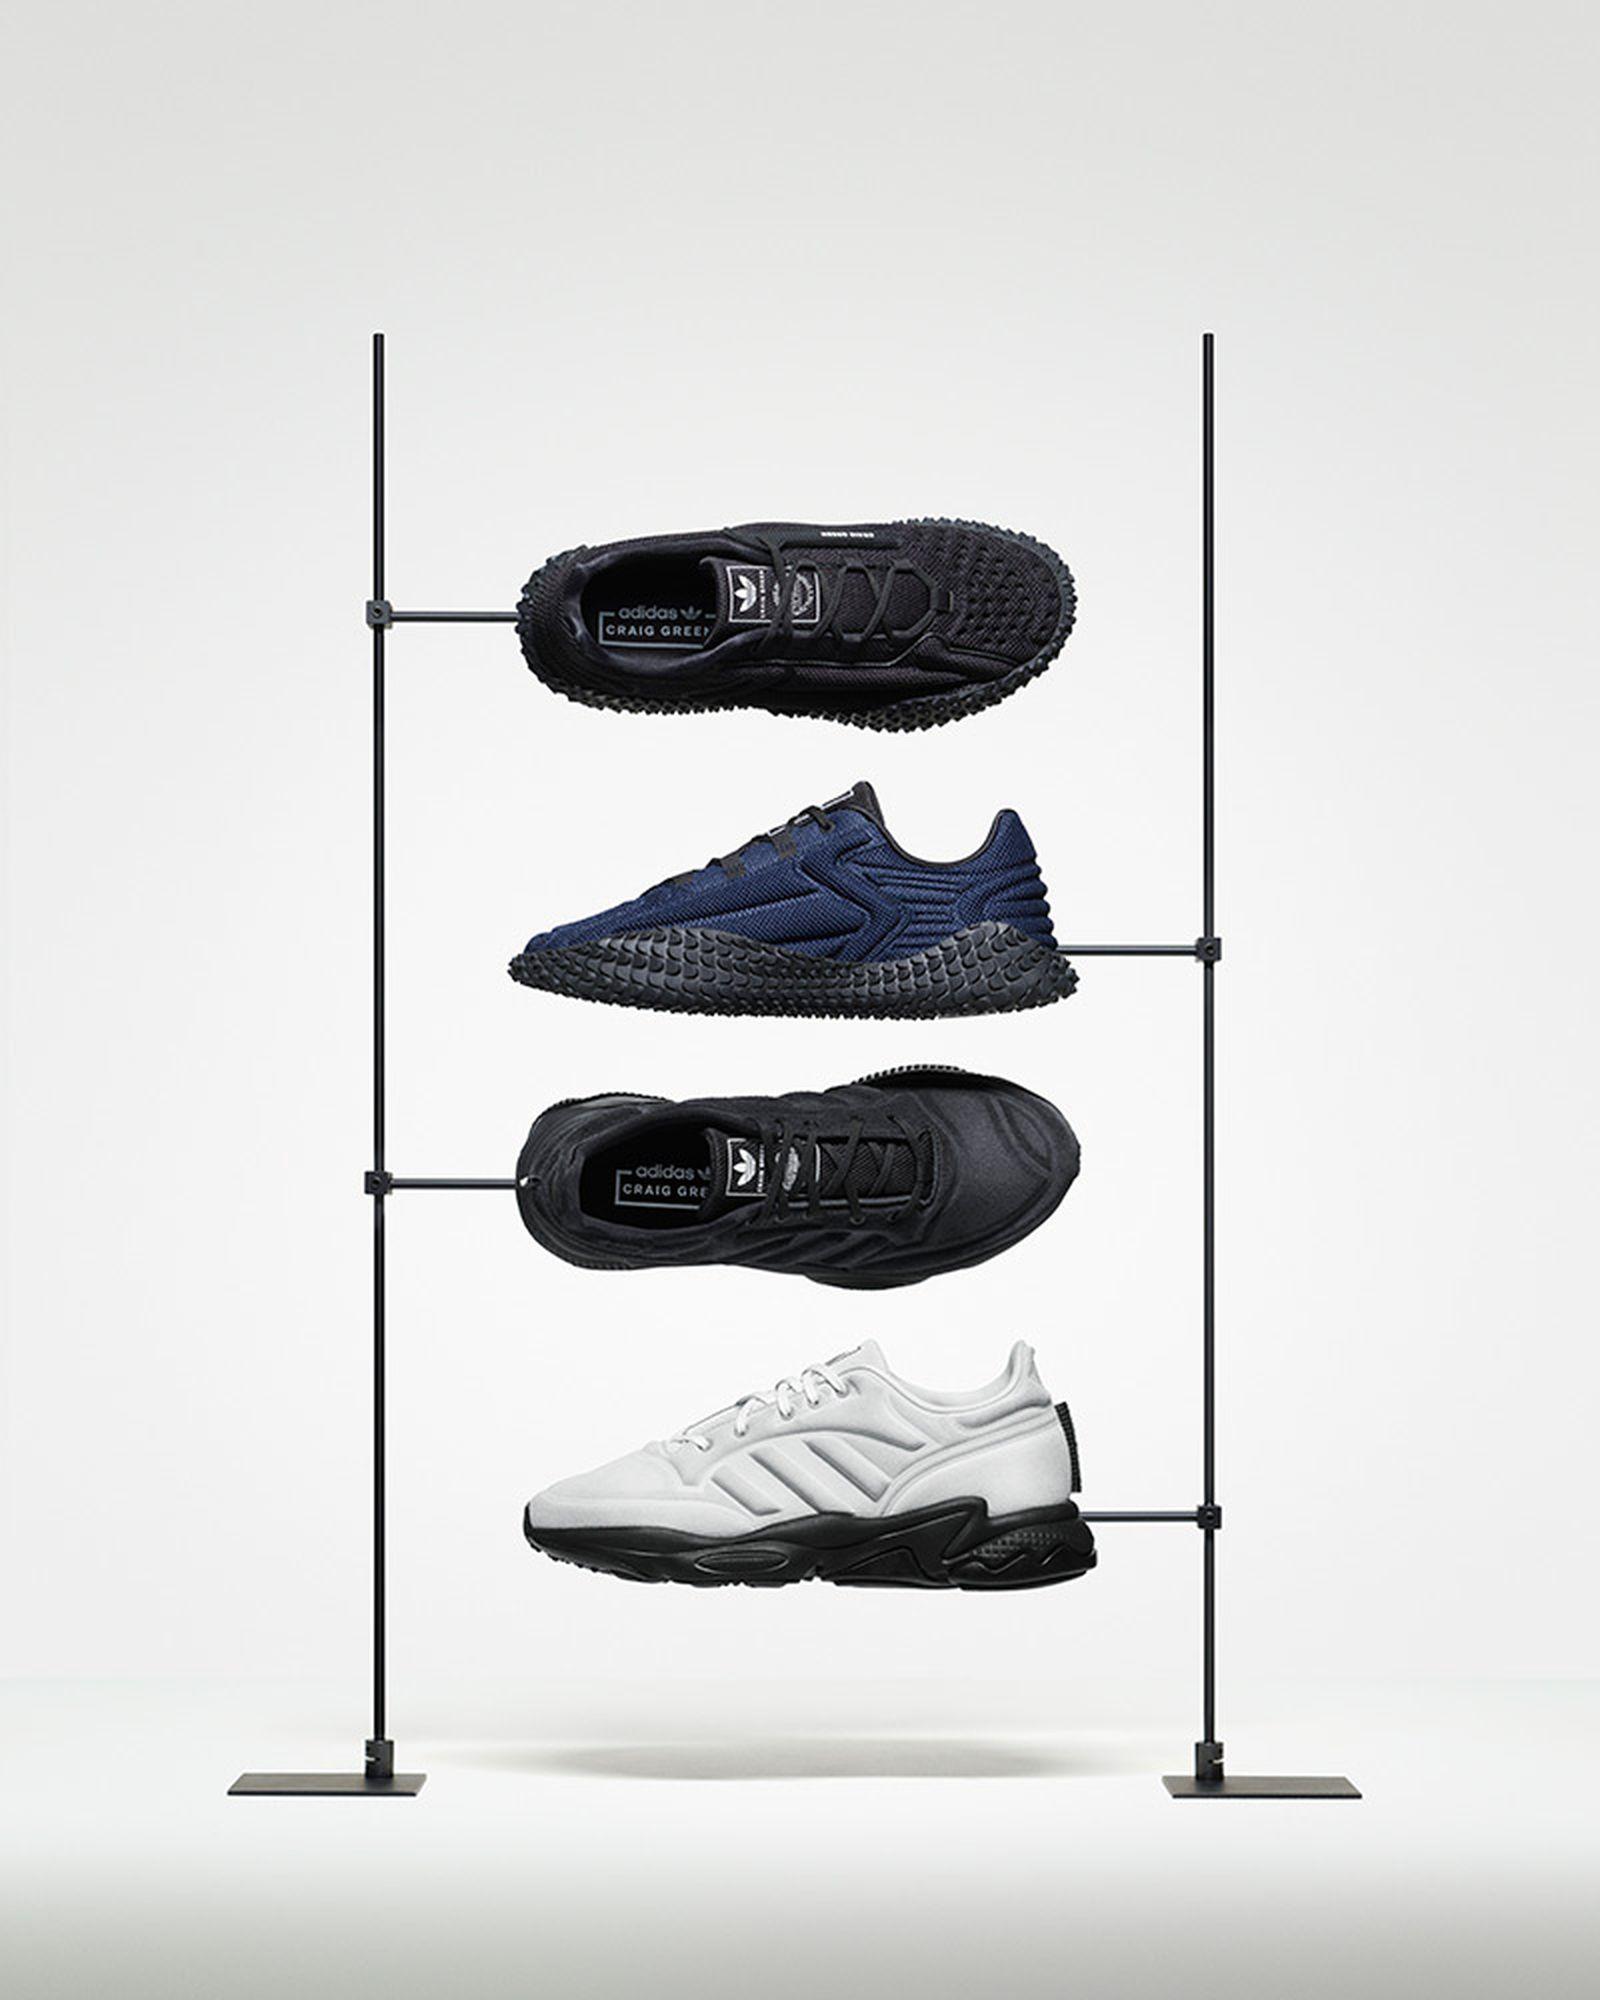 craig-green-adidas-originals-ss20-release-date-price-04